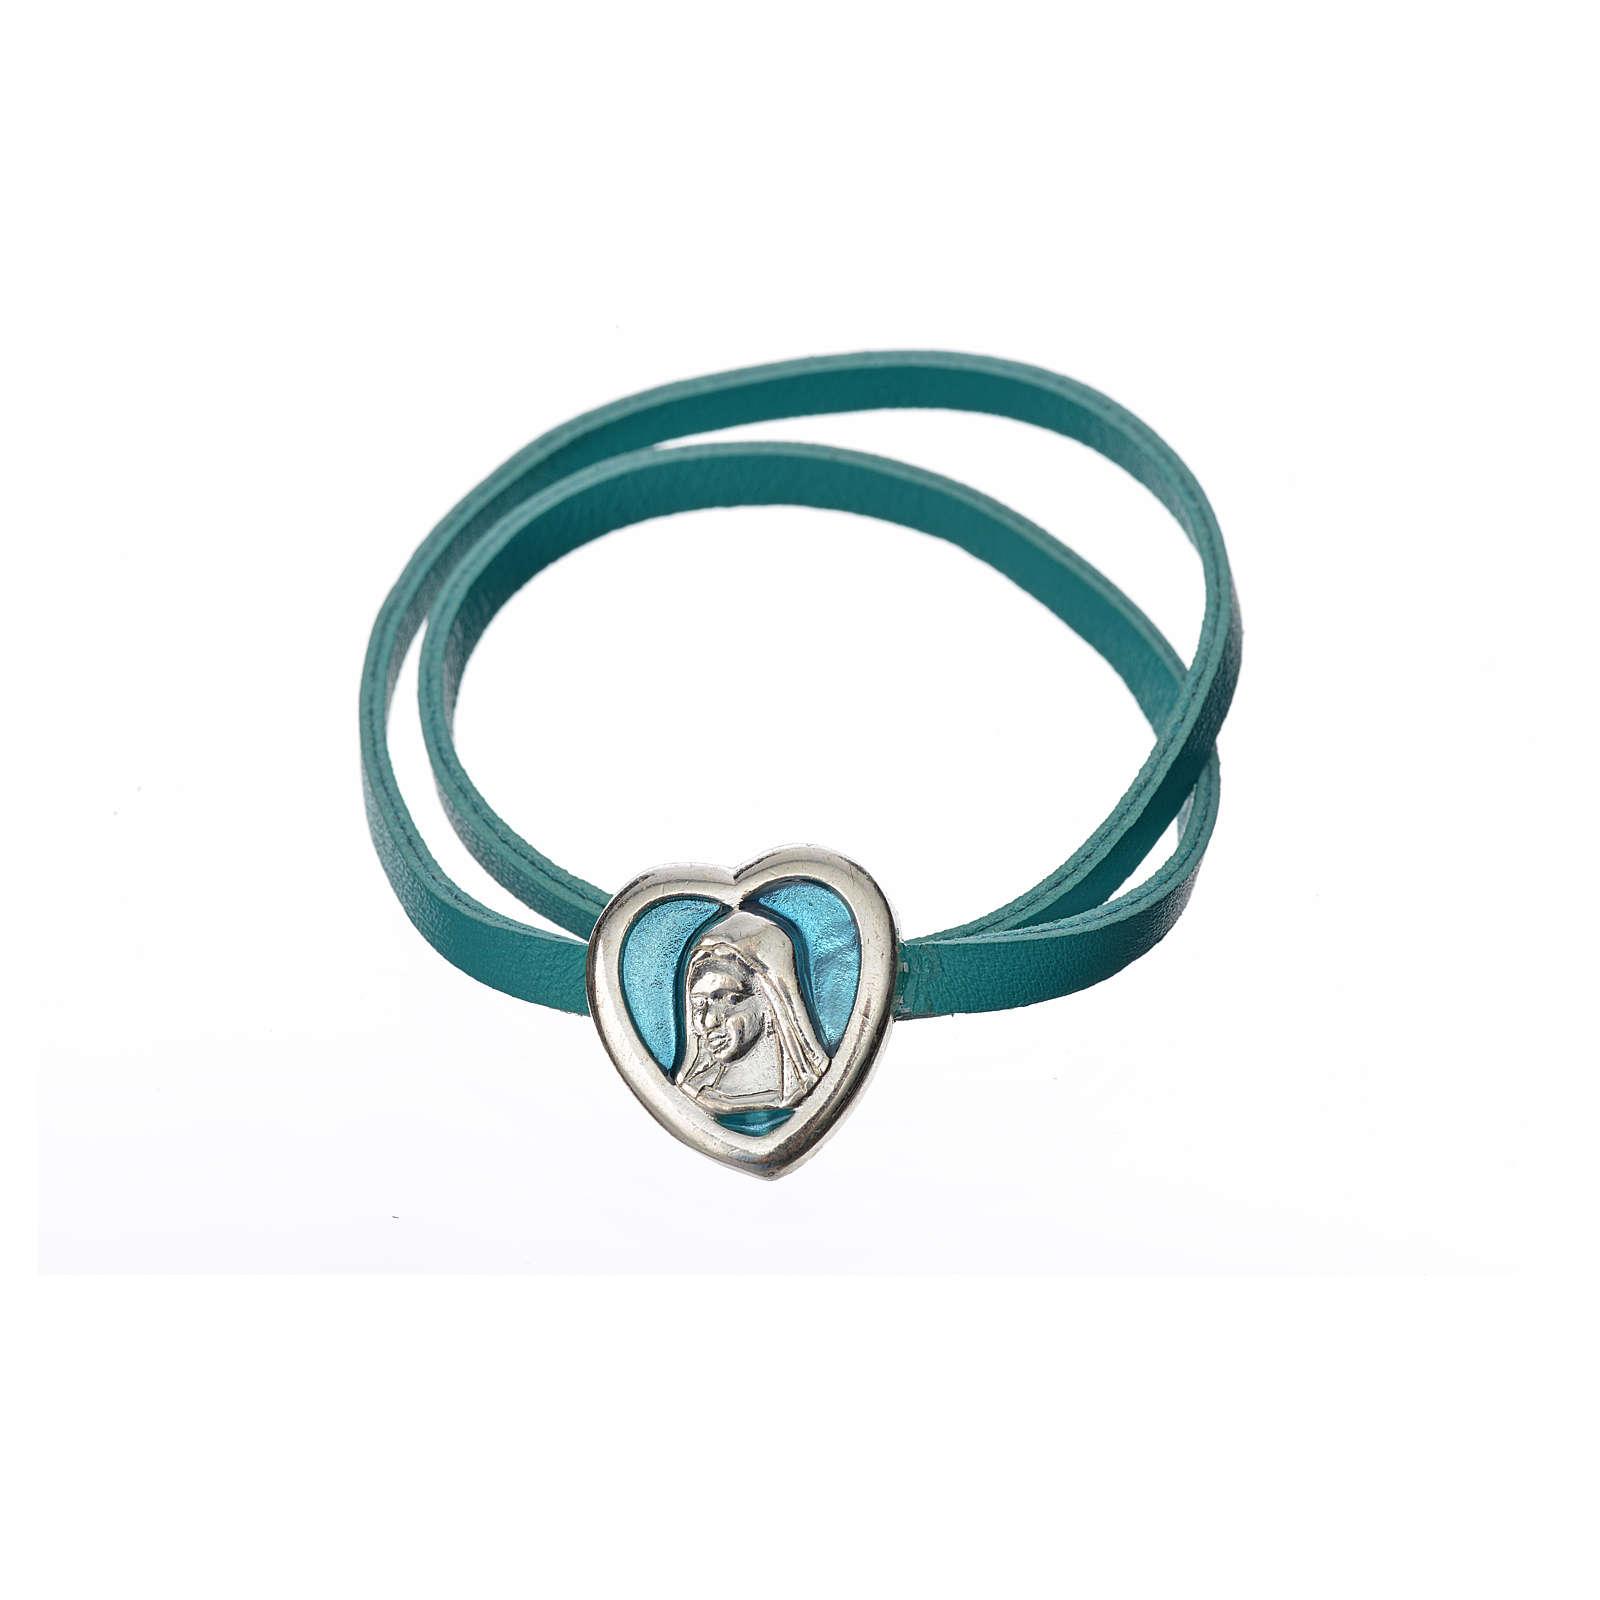 Ras-de-cou image Vierge Marie cuir bleu clair 4